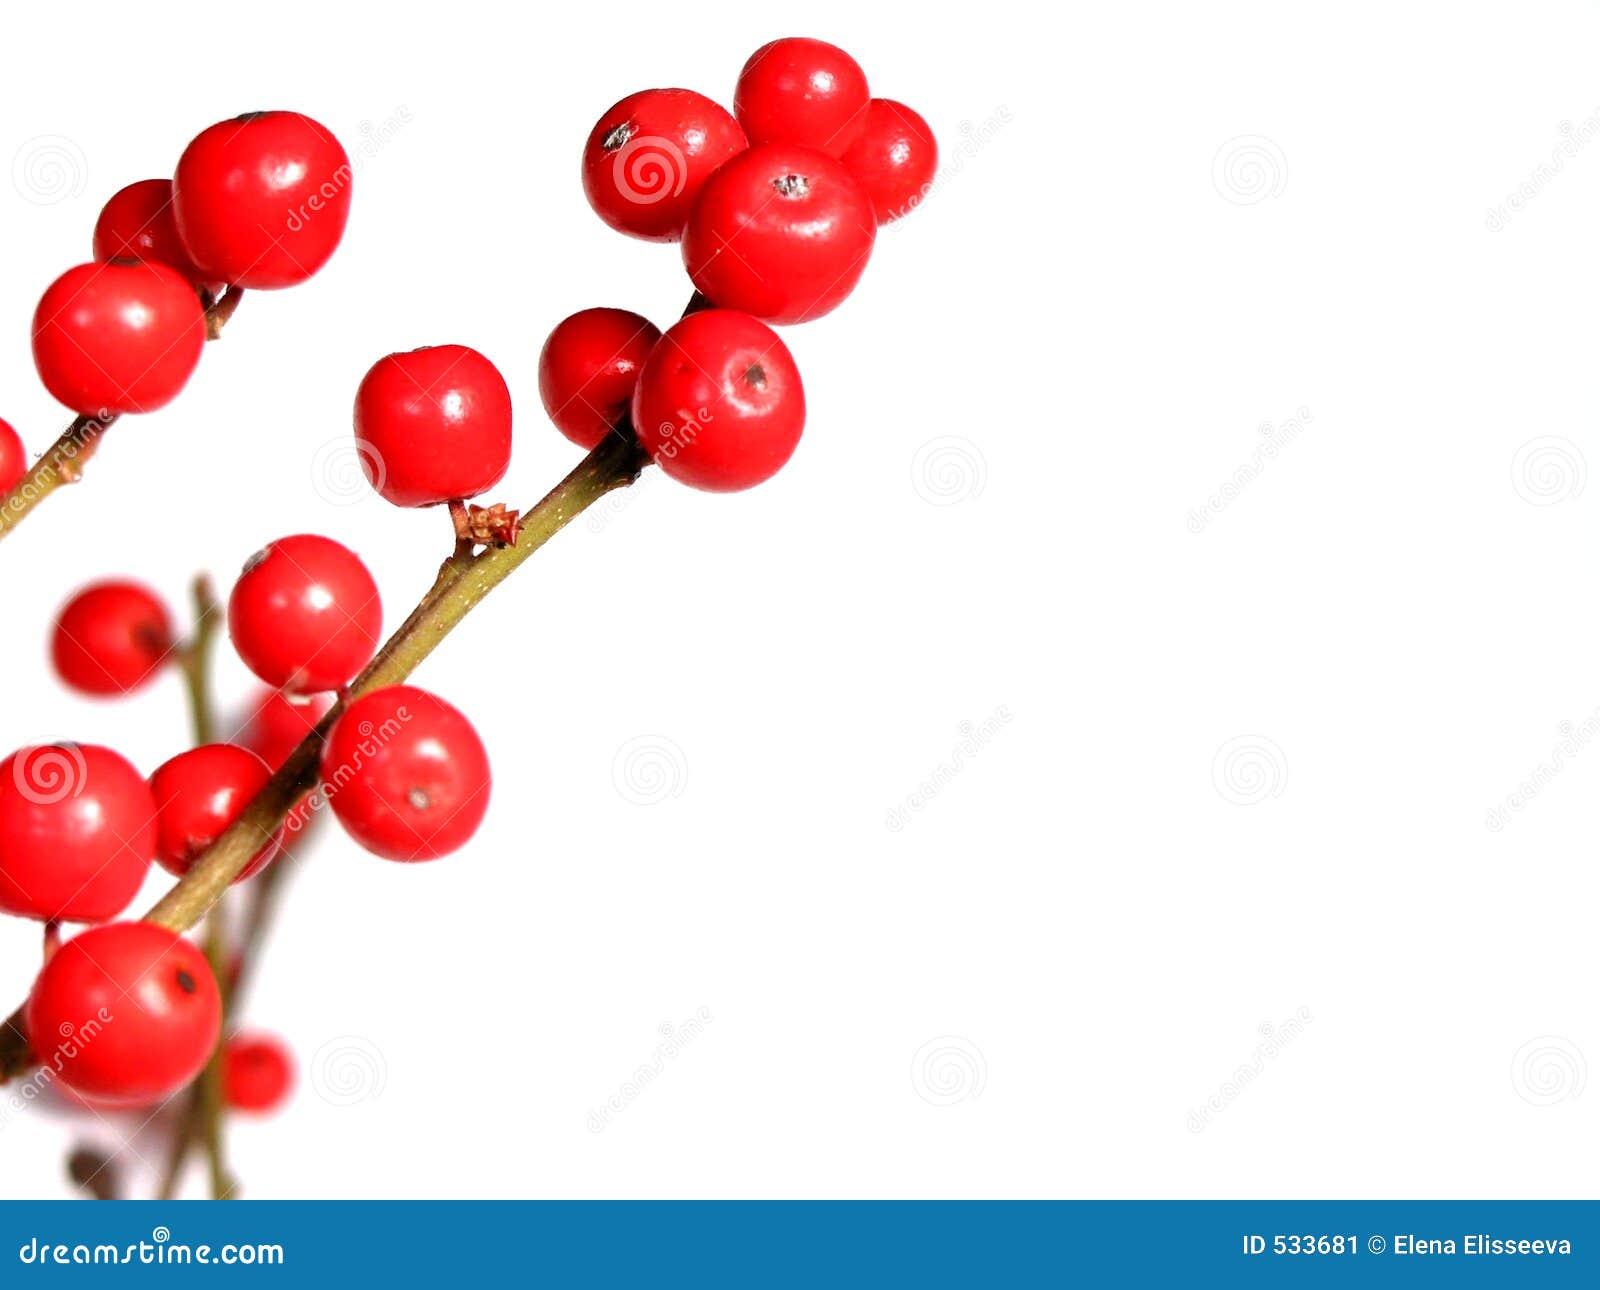 Download 浆果圣诞节红色白色 库存图片. 图片 包括有 红色, 白兰地酒, 明信片, 枝杈, 结构树, brander - 533681